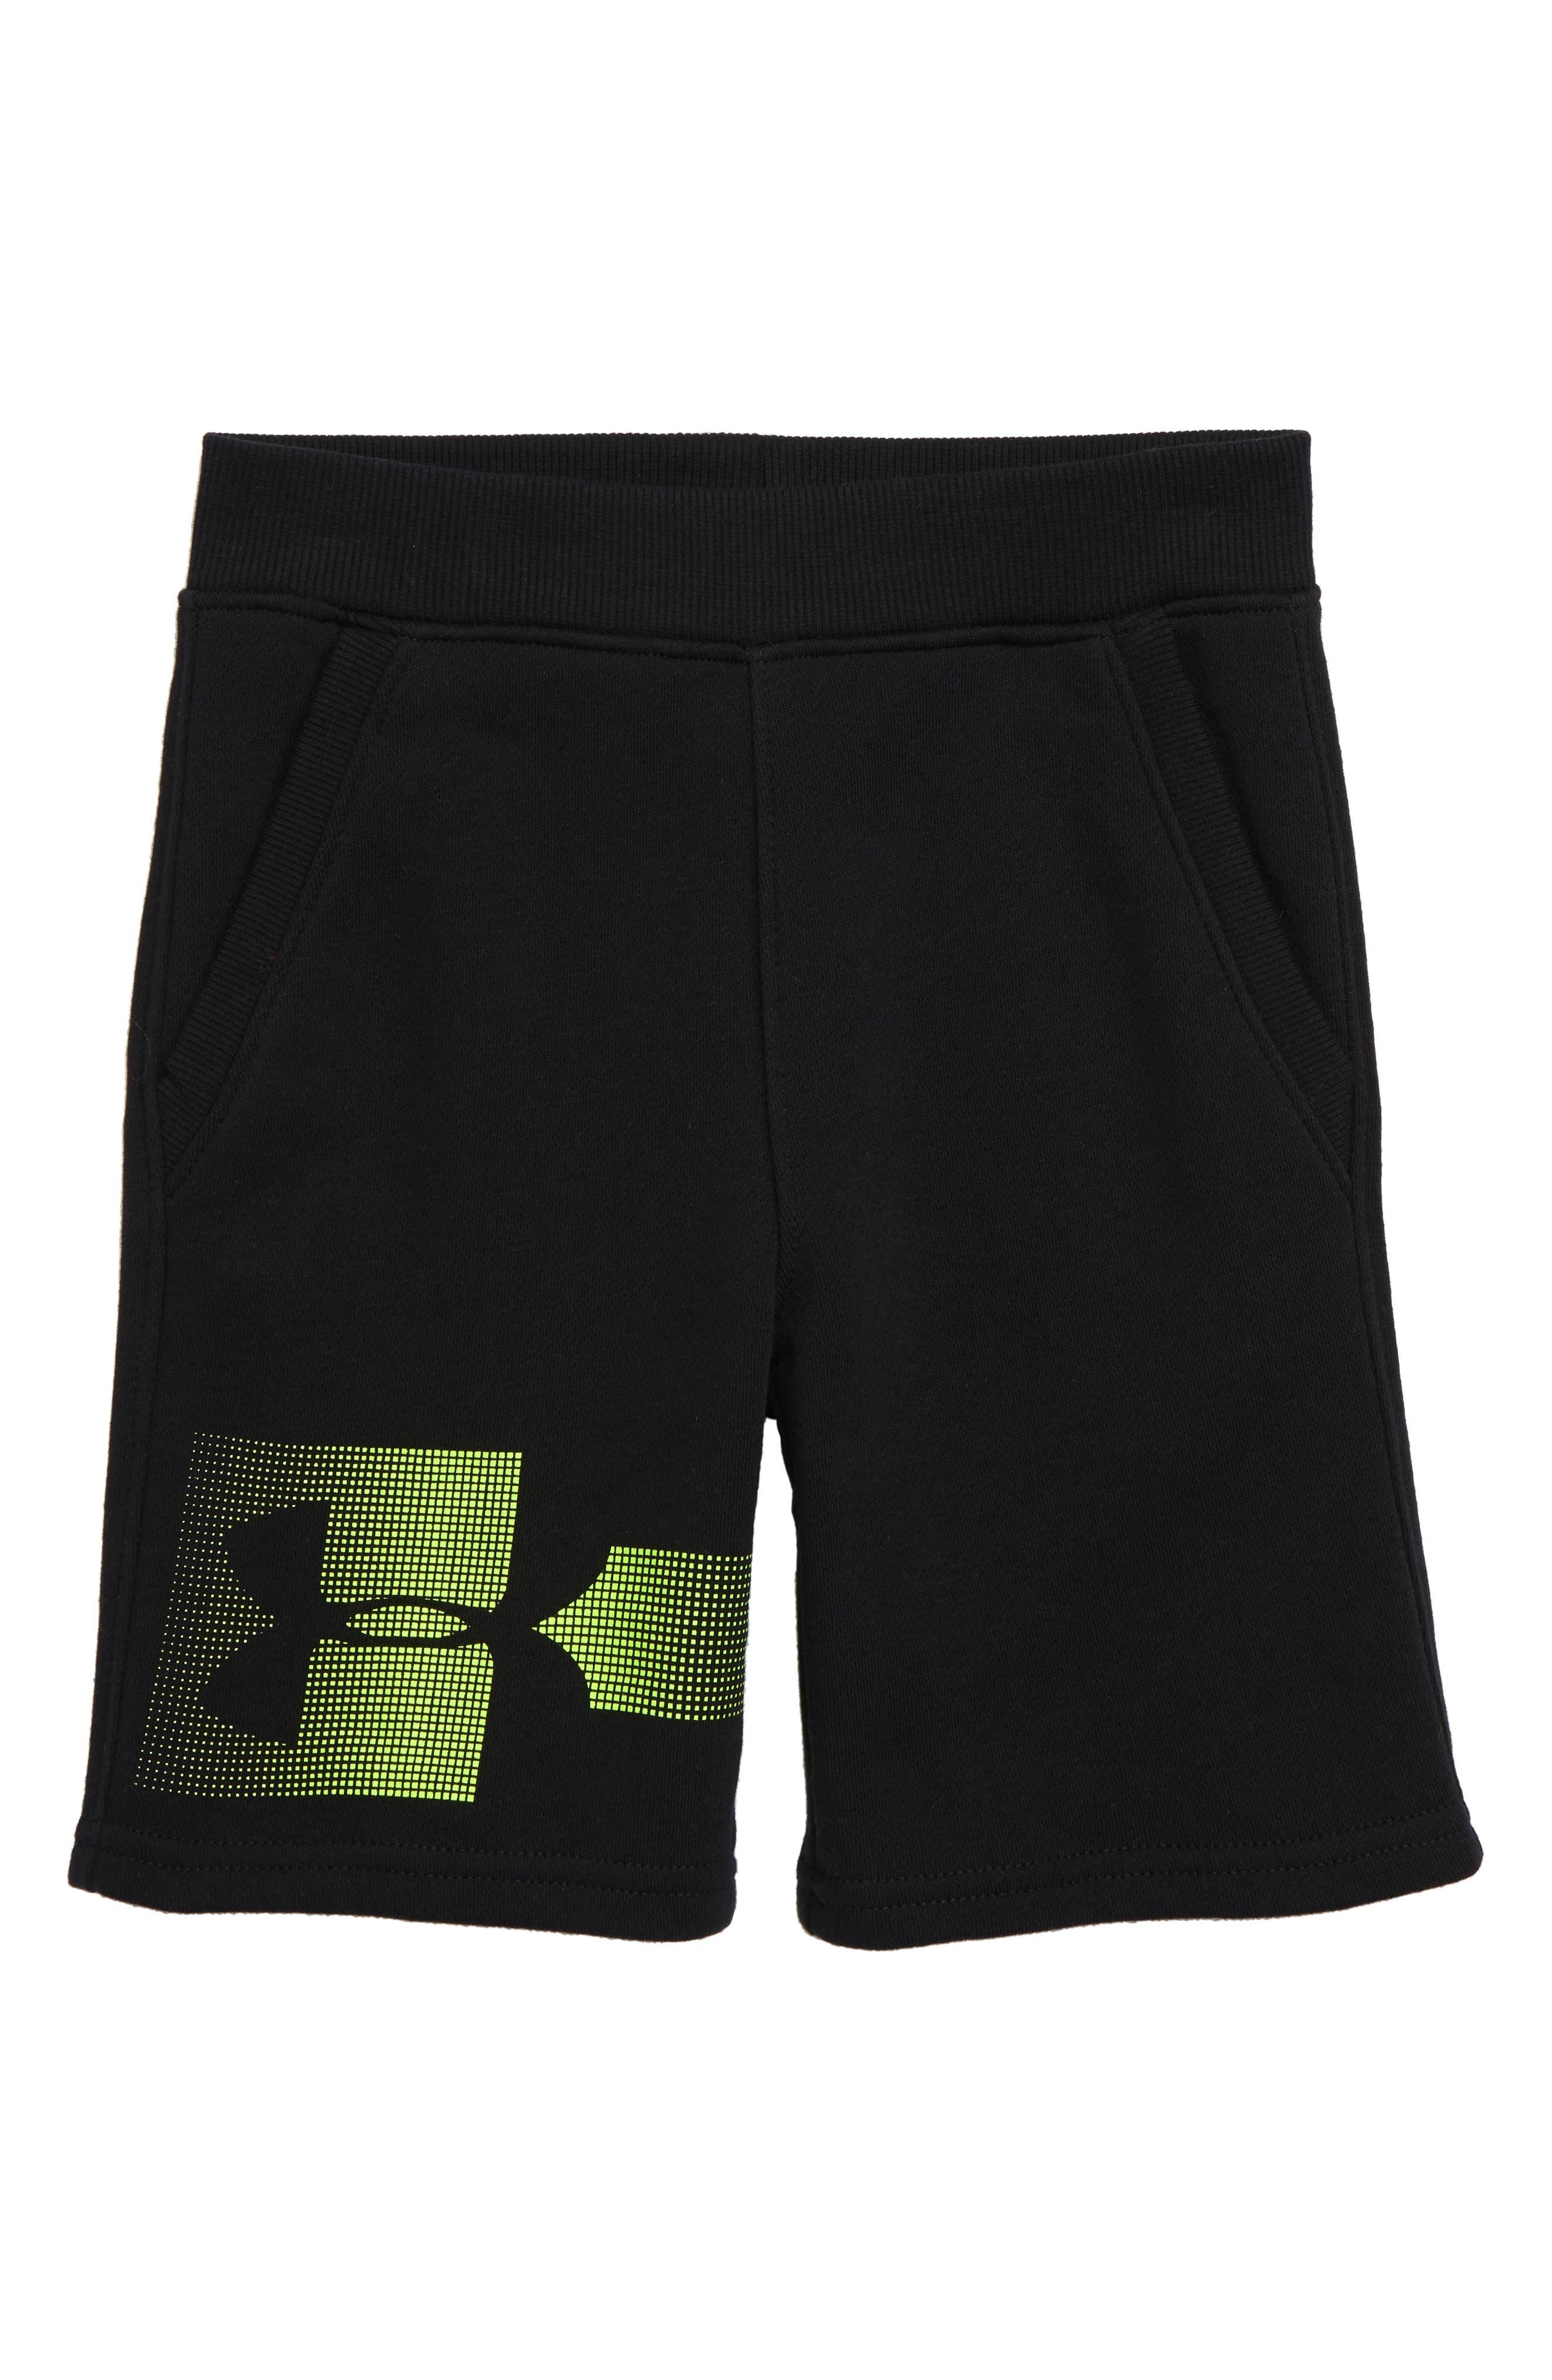 Boys Under Armour Rival Heatgear Shorts Size 7  Black